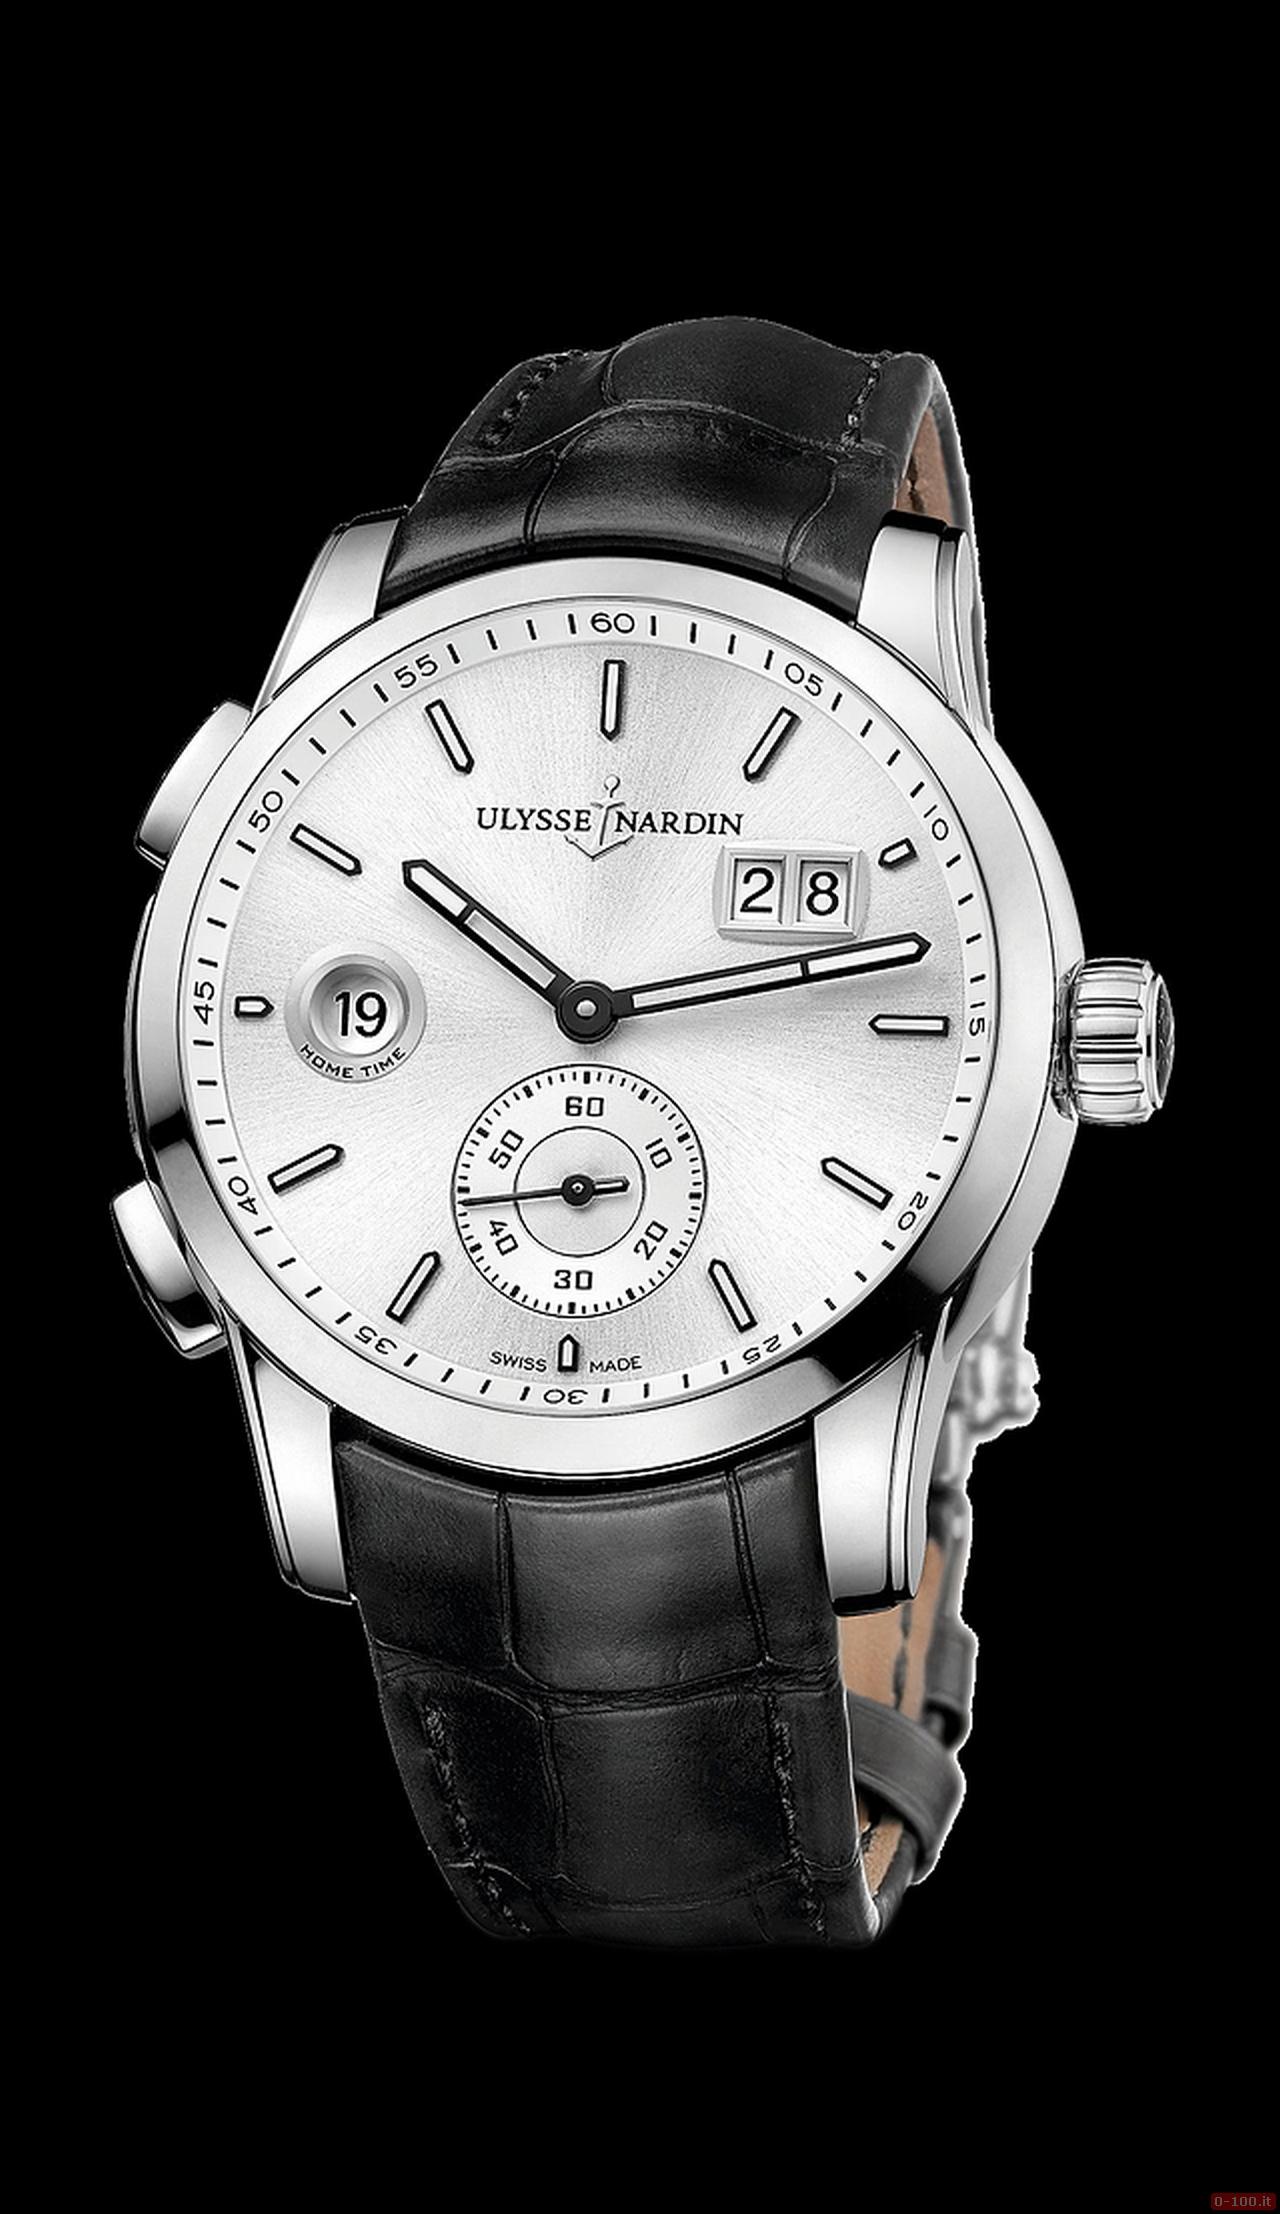 anteprima-baselworld-2014-ulysse-nardin-dual-time-manufacture_0-1003